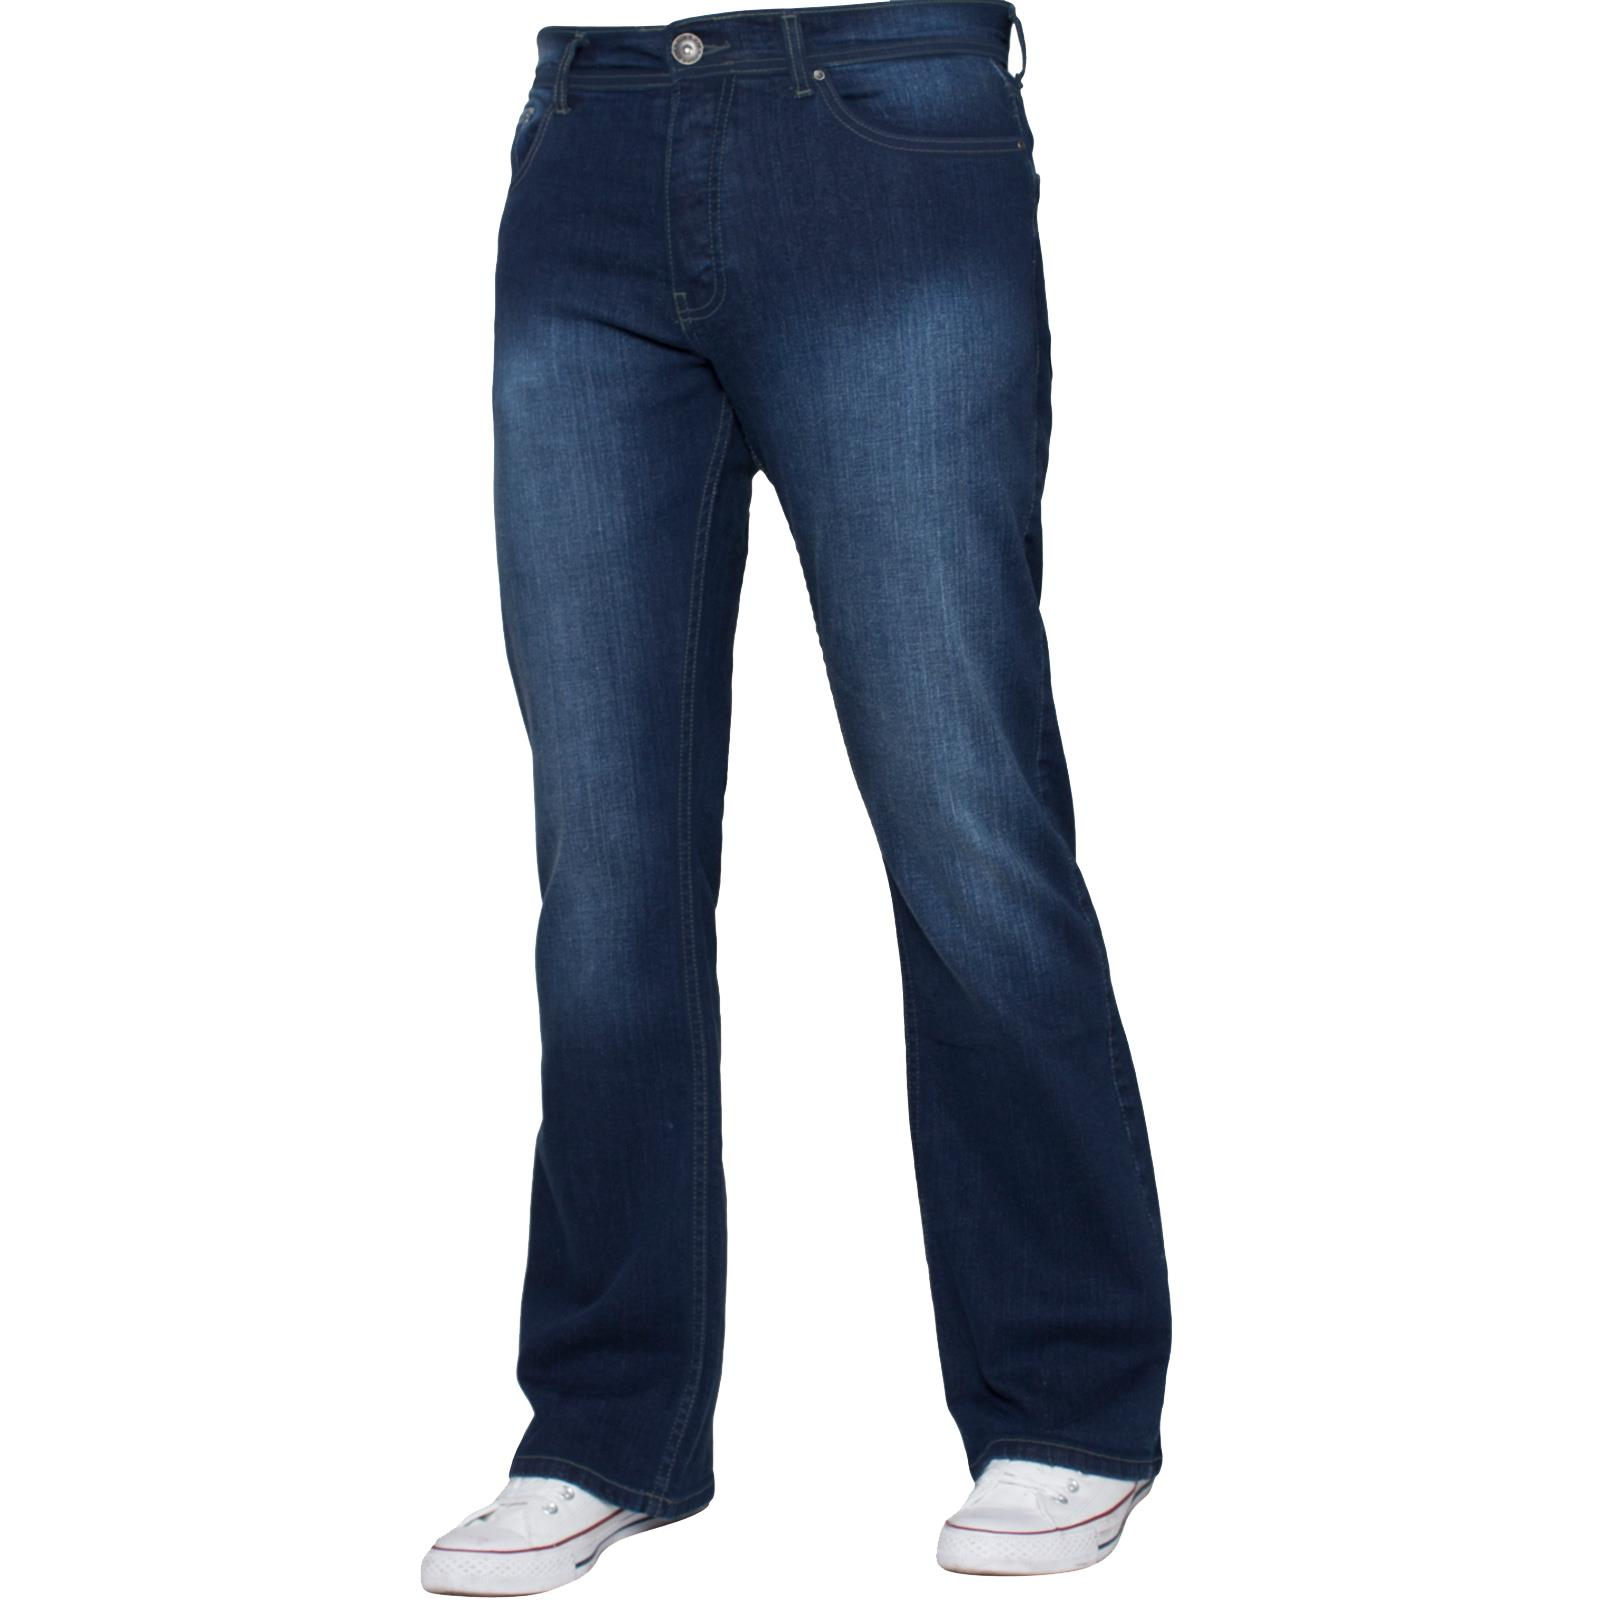 Enzo-Mens-Big-Tall-Jeans-Leg-King-Size-Denim-Pants-Chino-Trousers-Pants-44-034-60-034 thumbnail 113